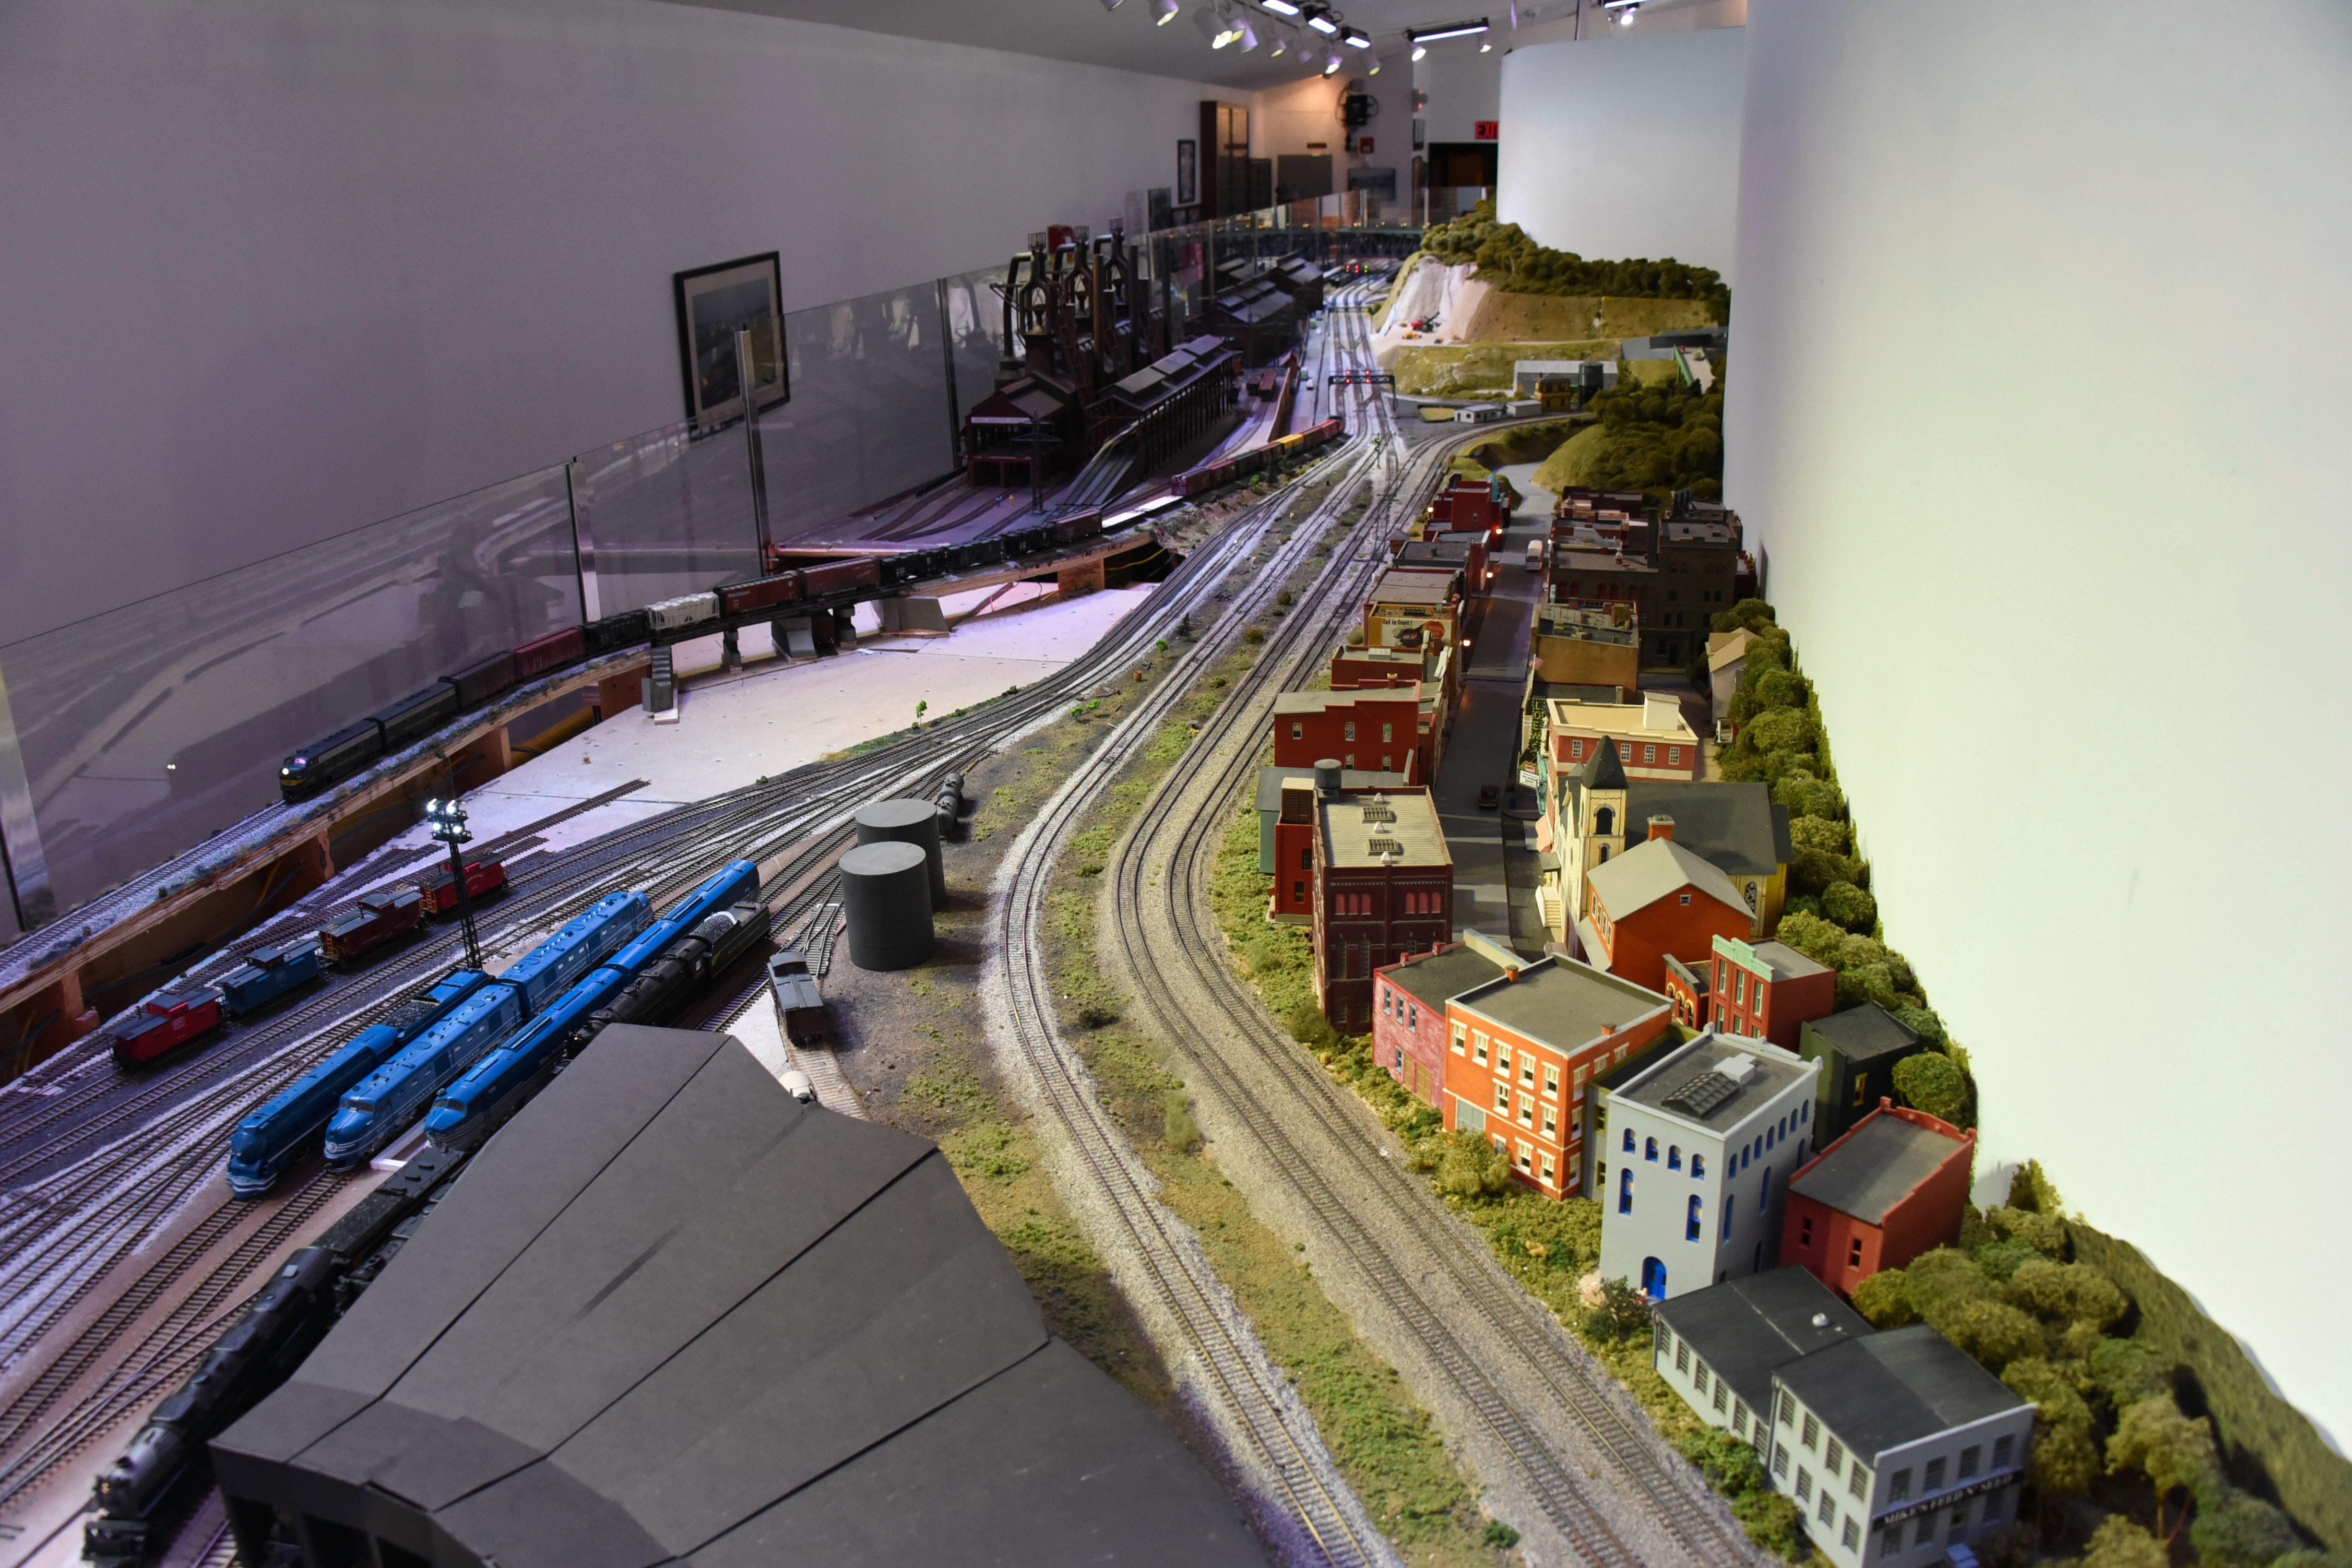 Now that's a big model railroad.